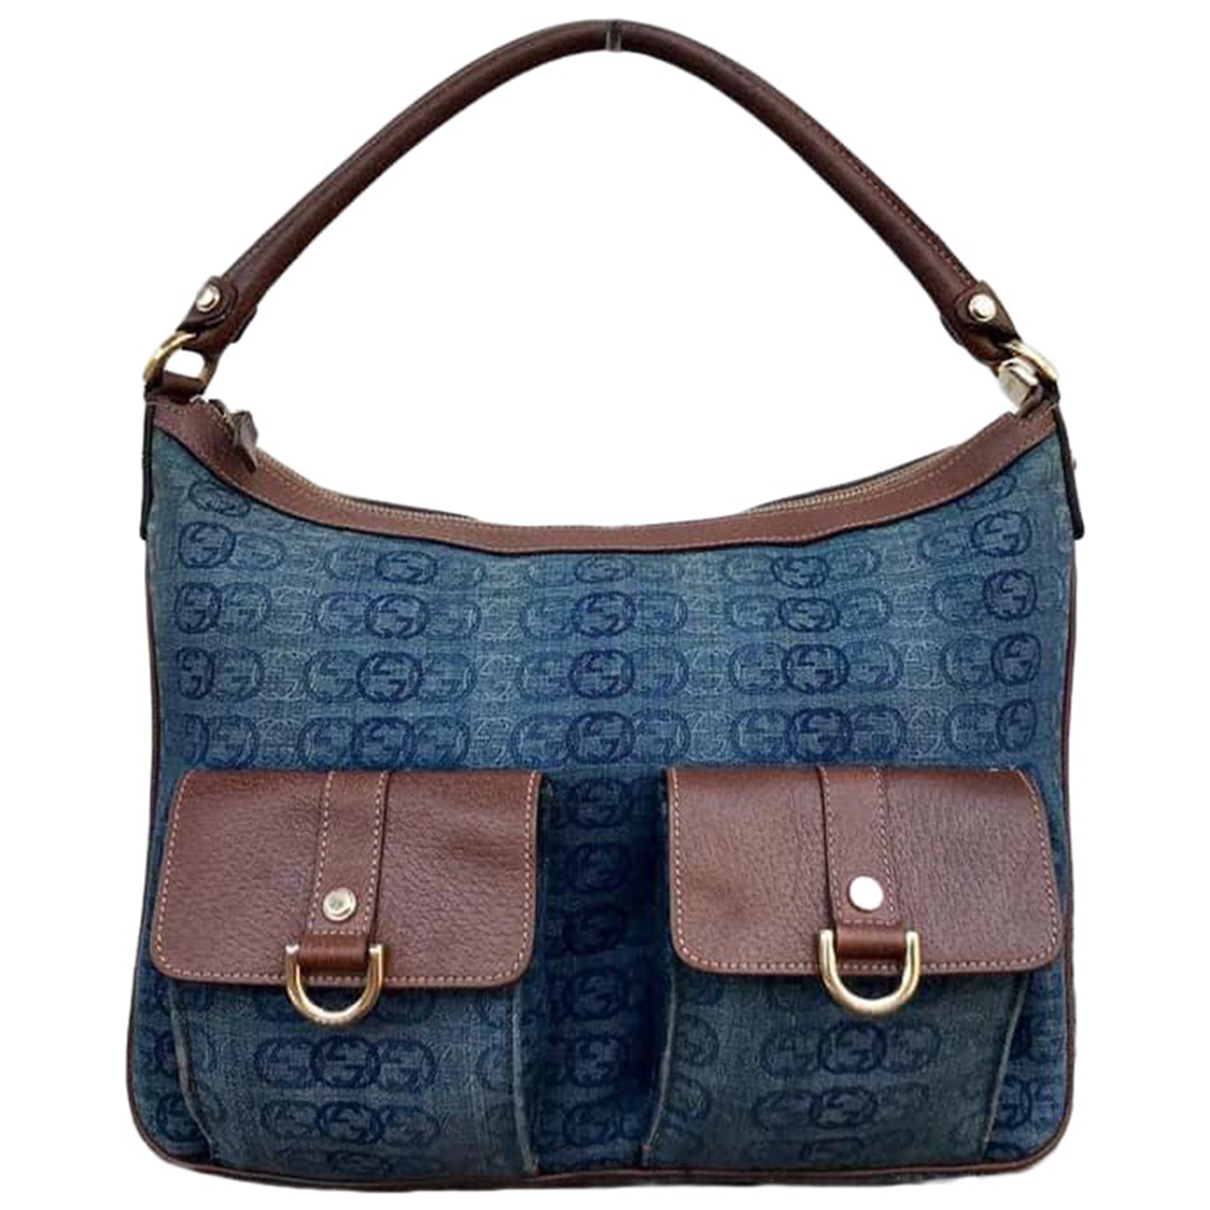 Gucci Hobo Handtasche in  Blau Denim - Jeans